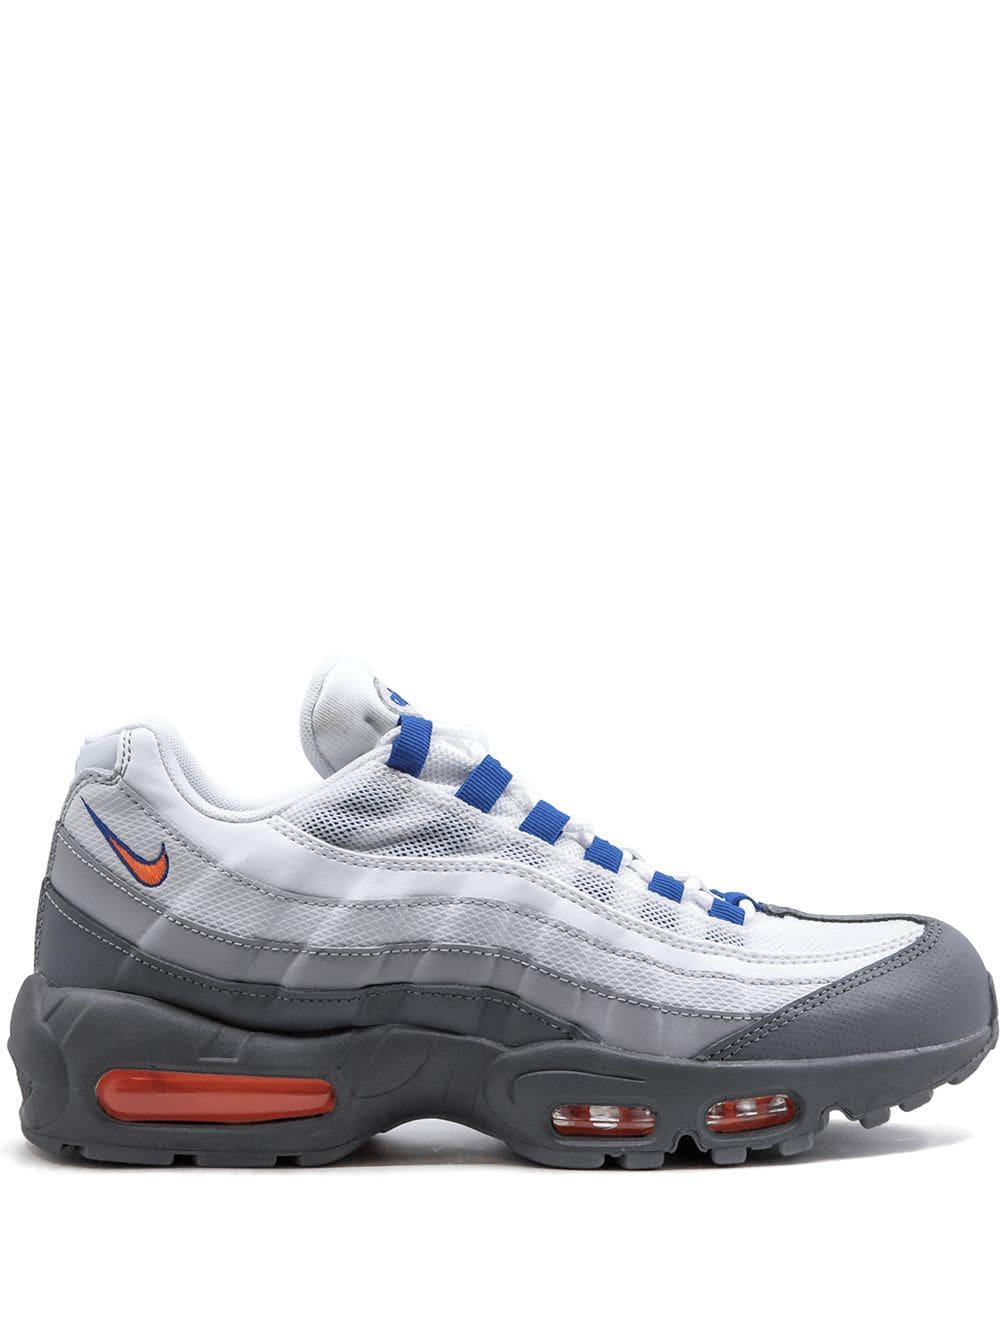 Nike Air Max 95 Essential sneakers Grey in 2019   Nike air